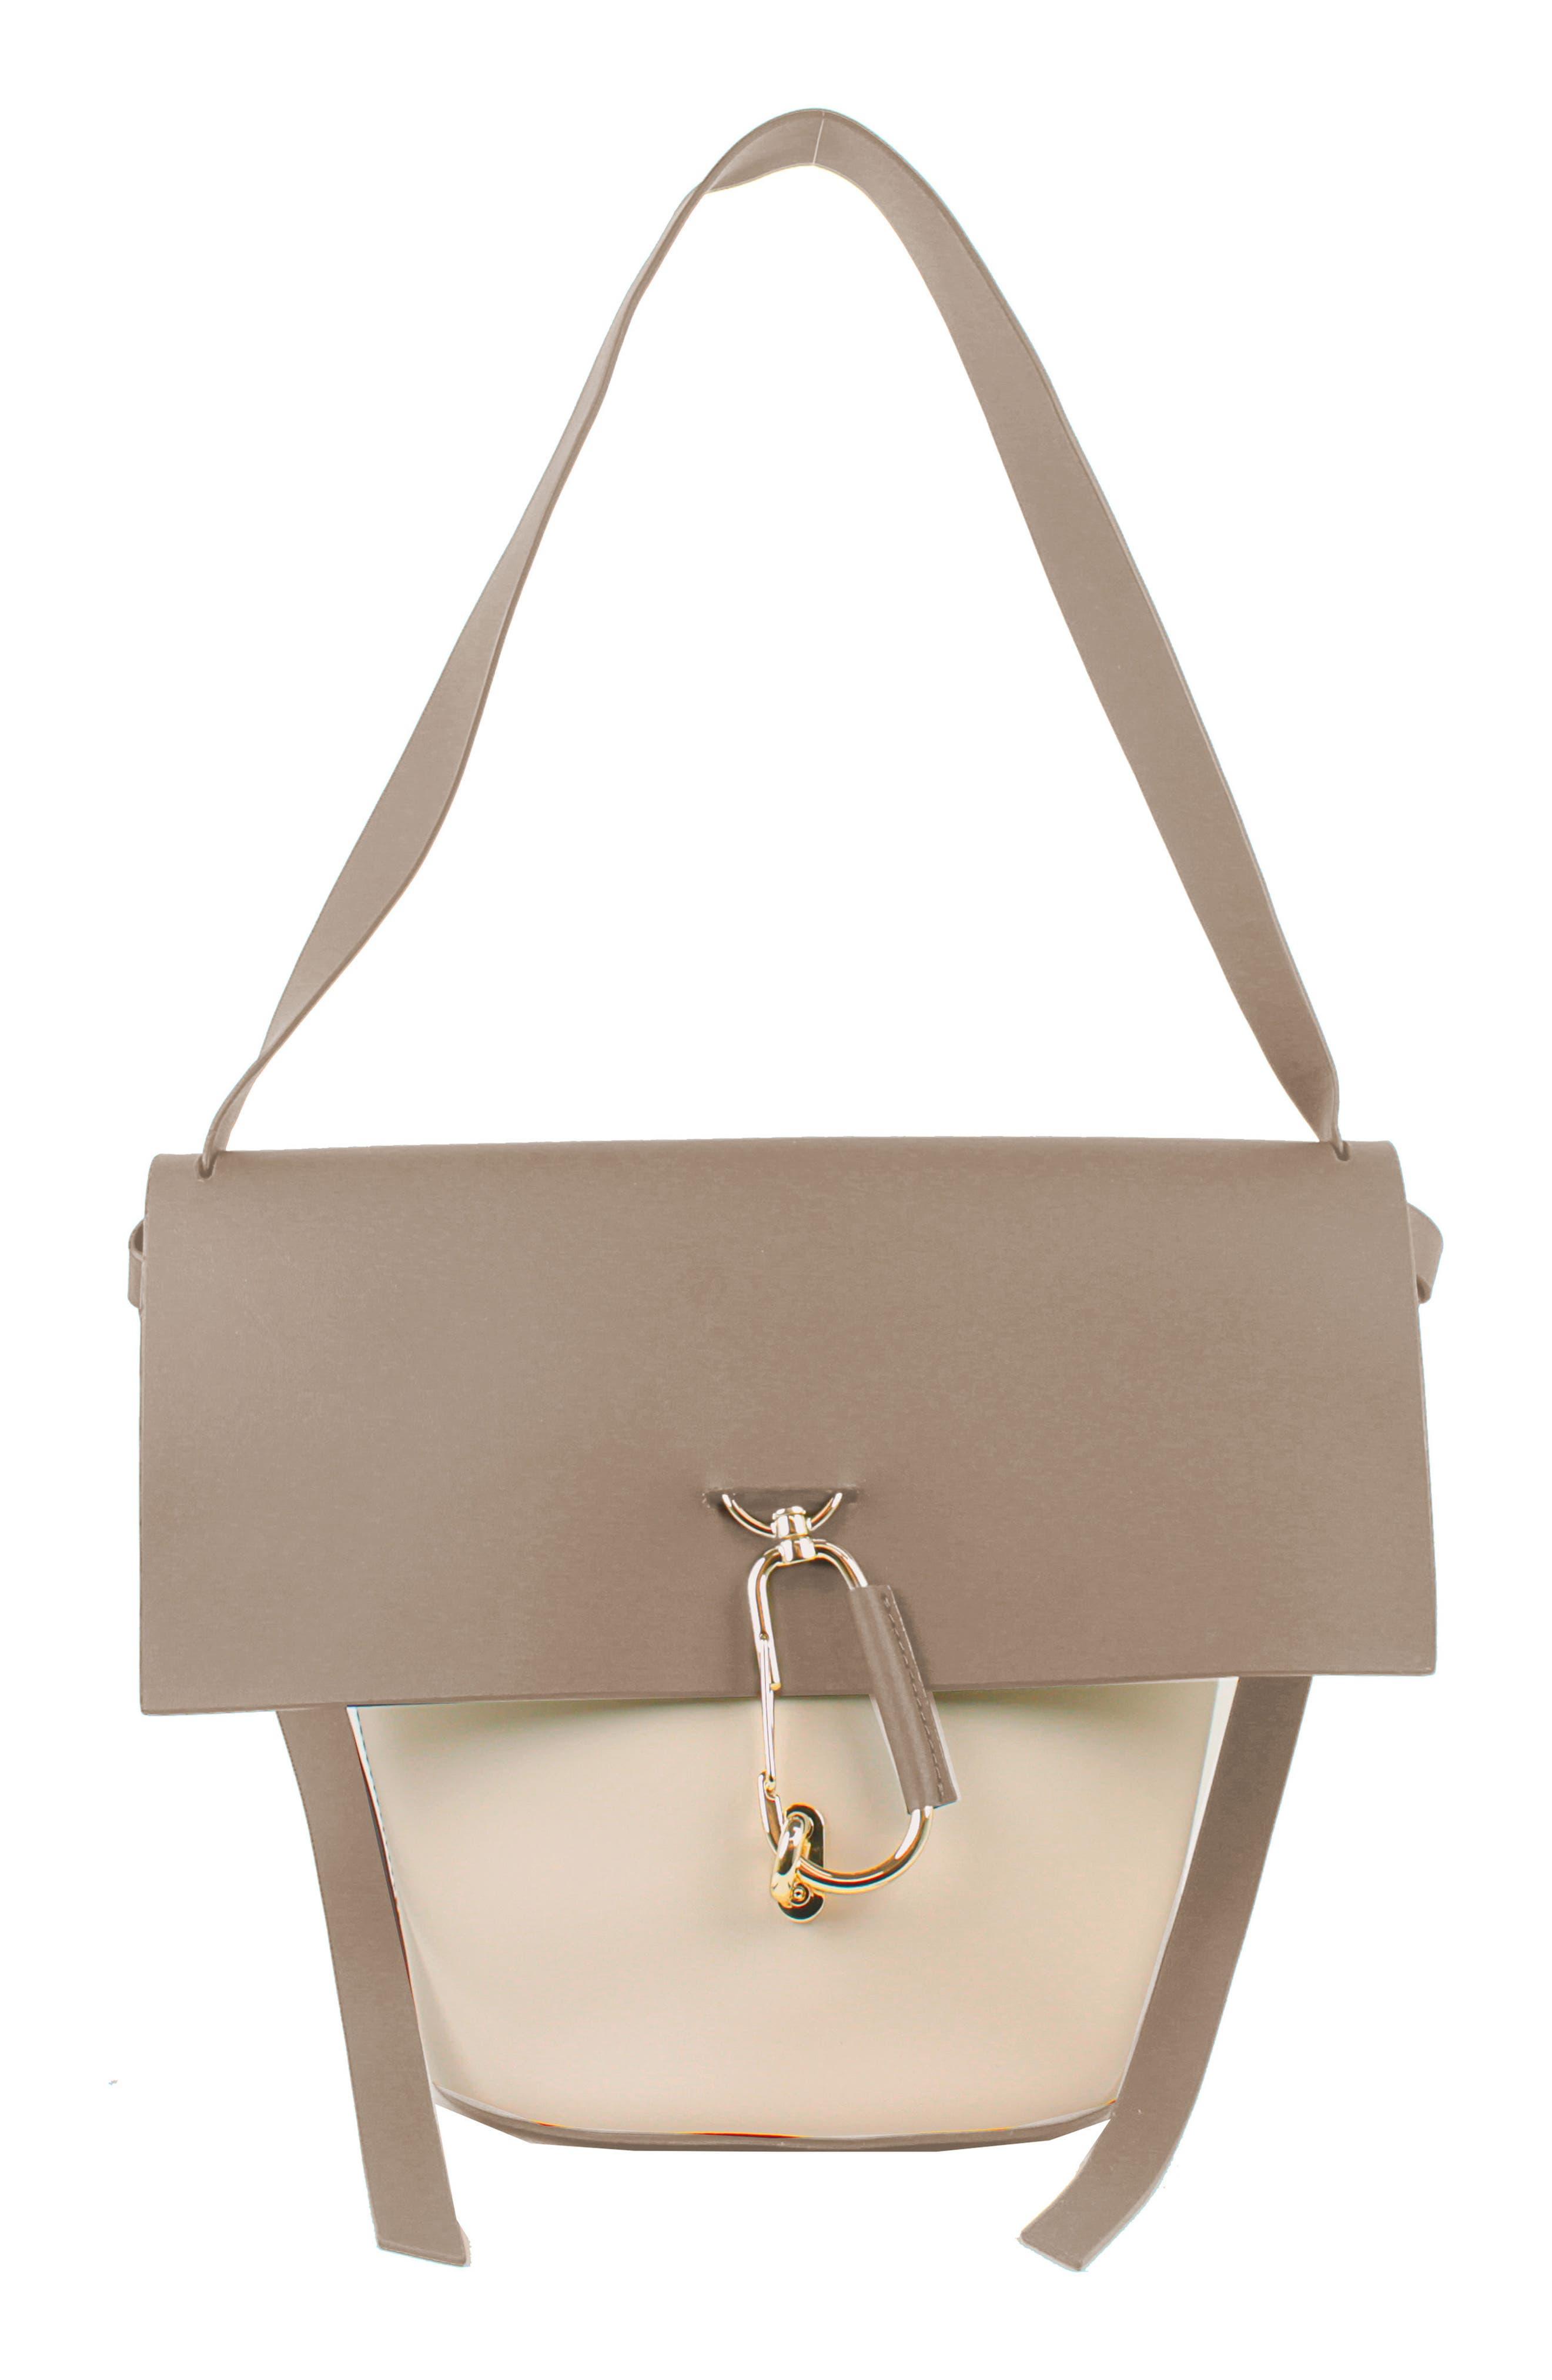 ZAC Zac Posen Belay Leather Shoulder Bag